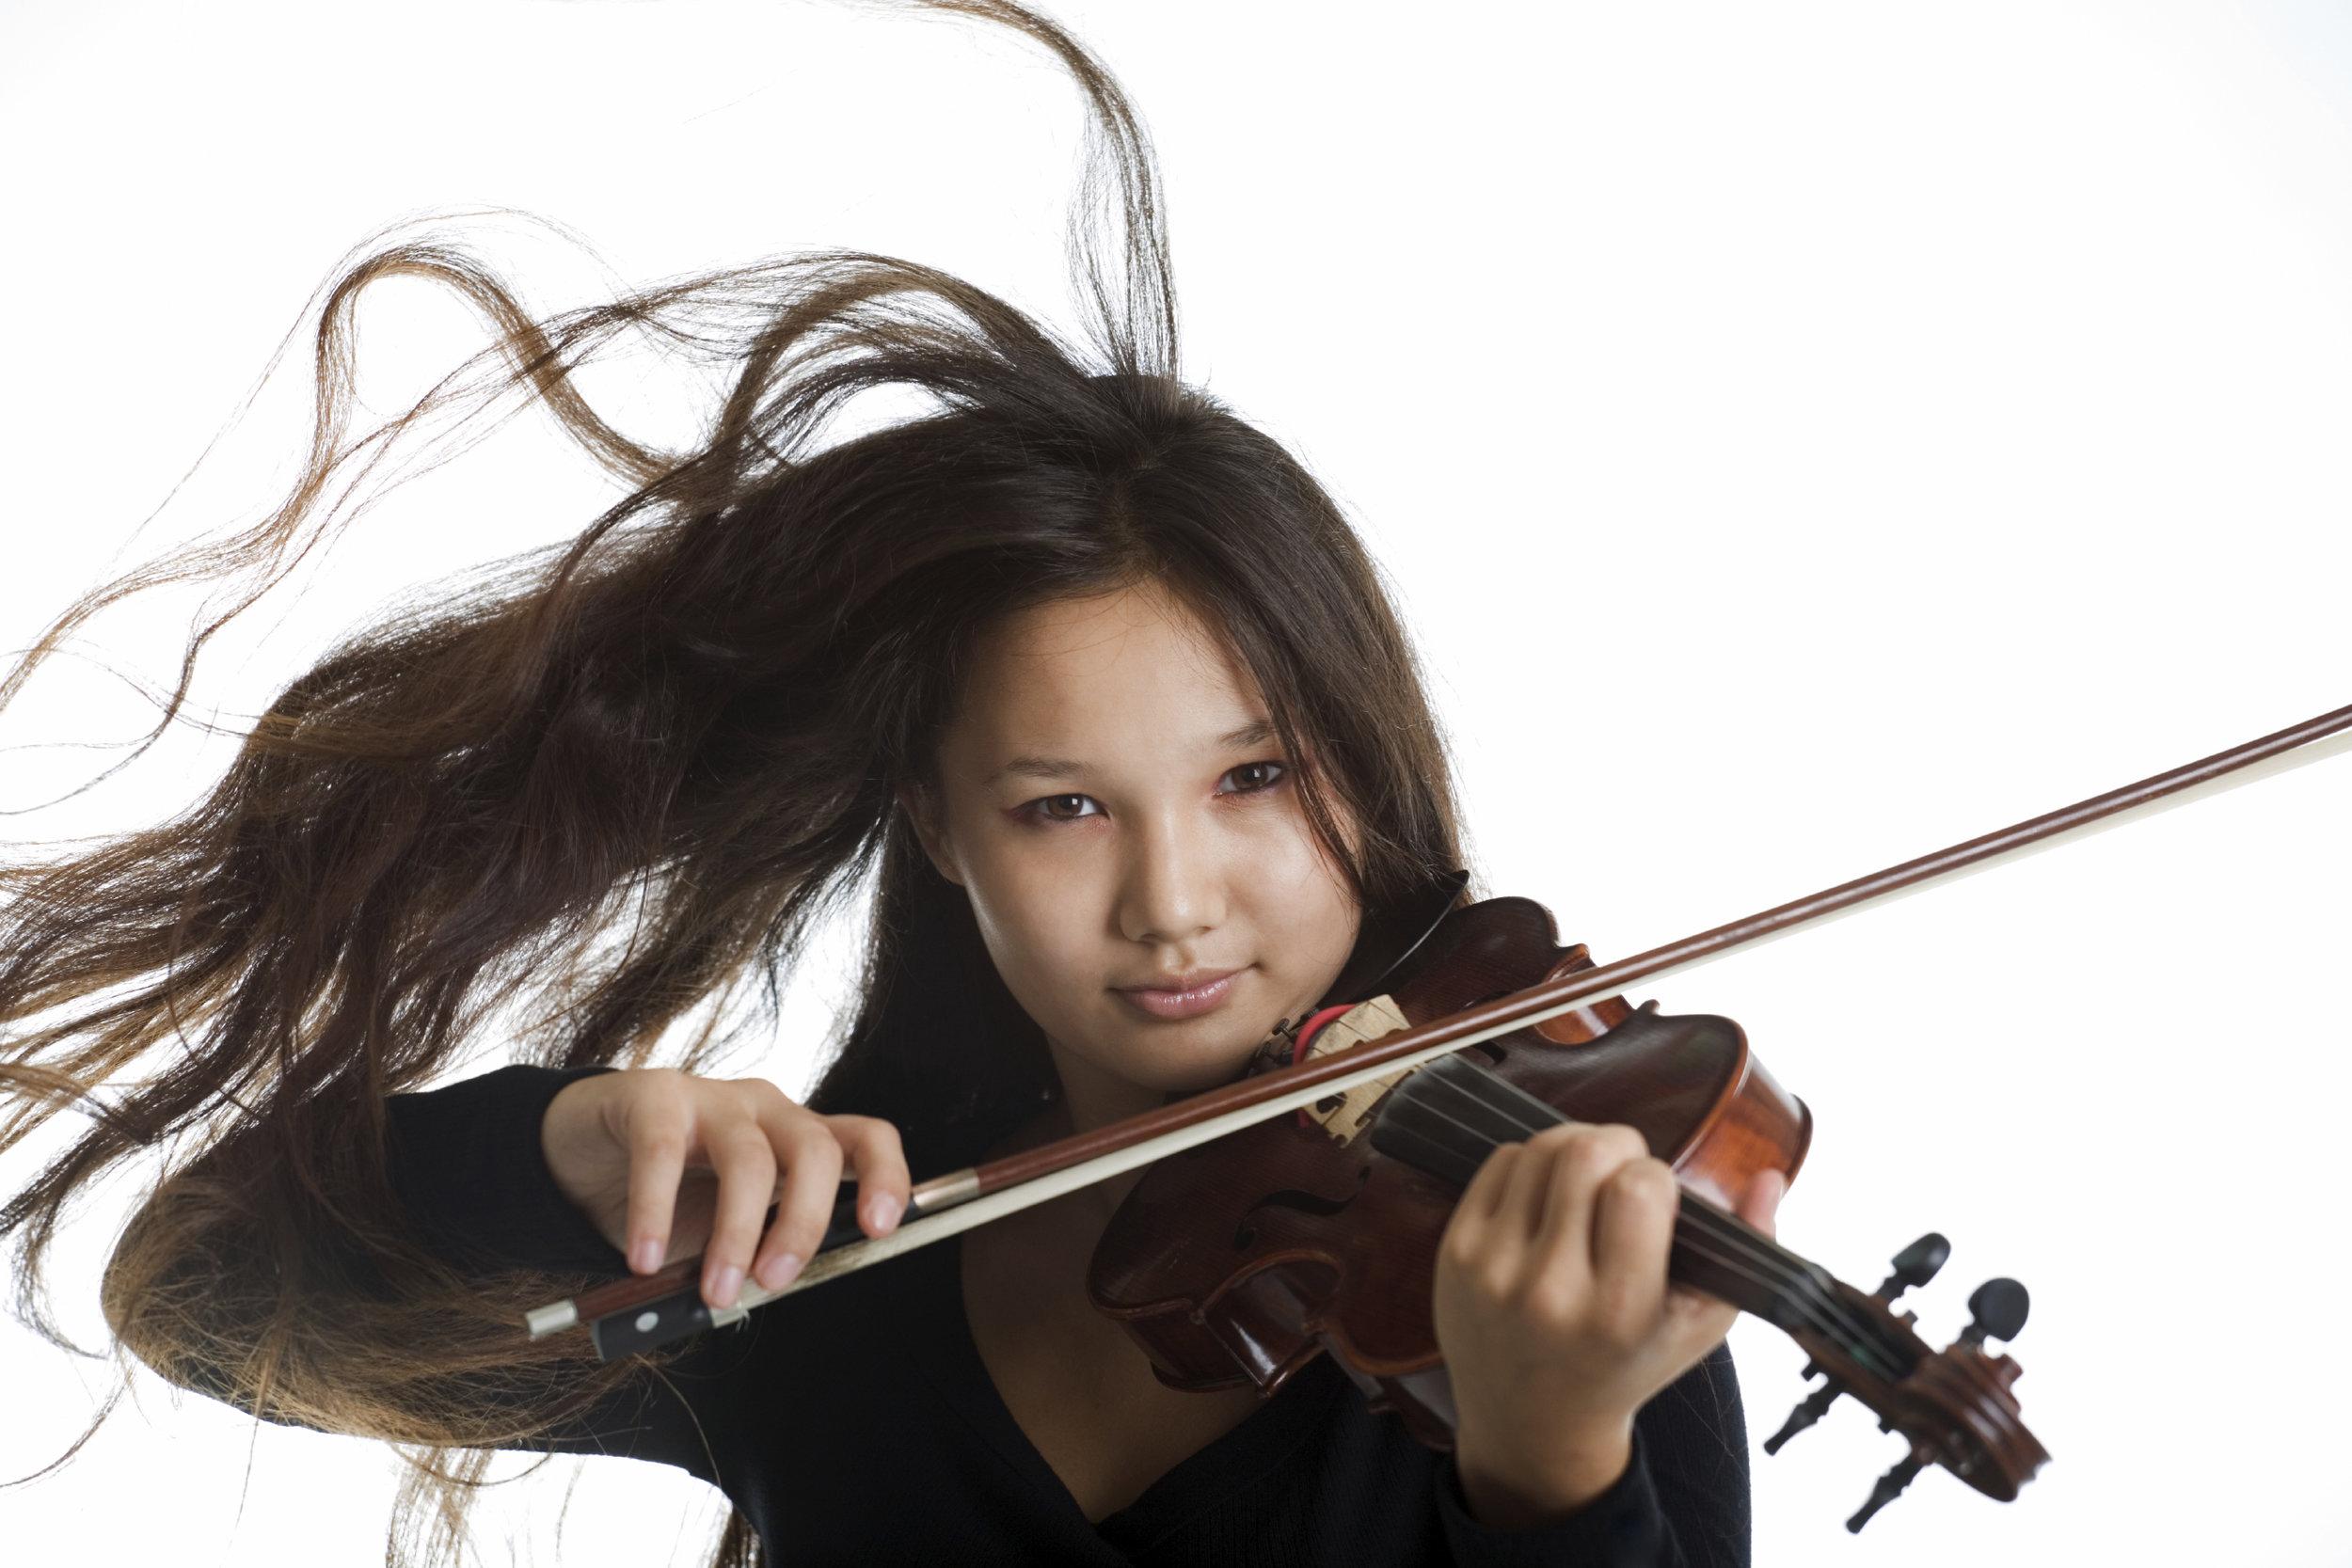 Violine_3x2.jpg